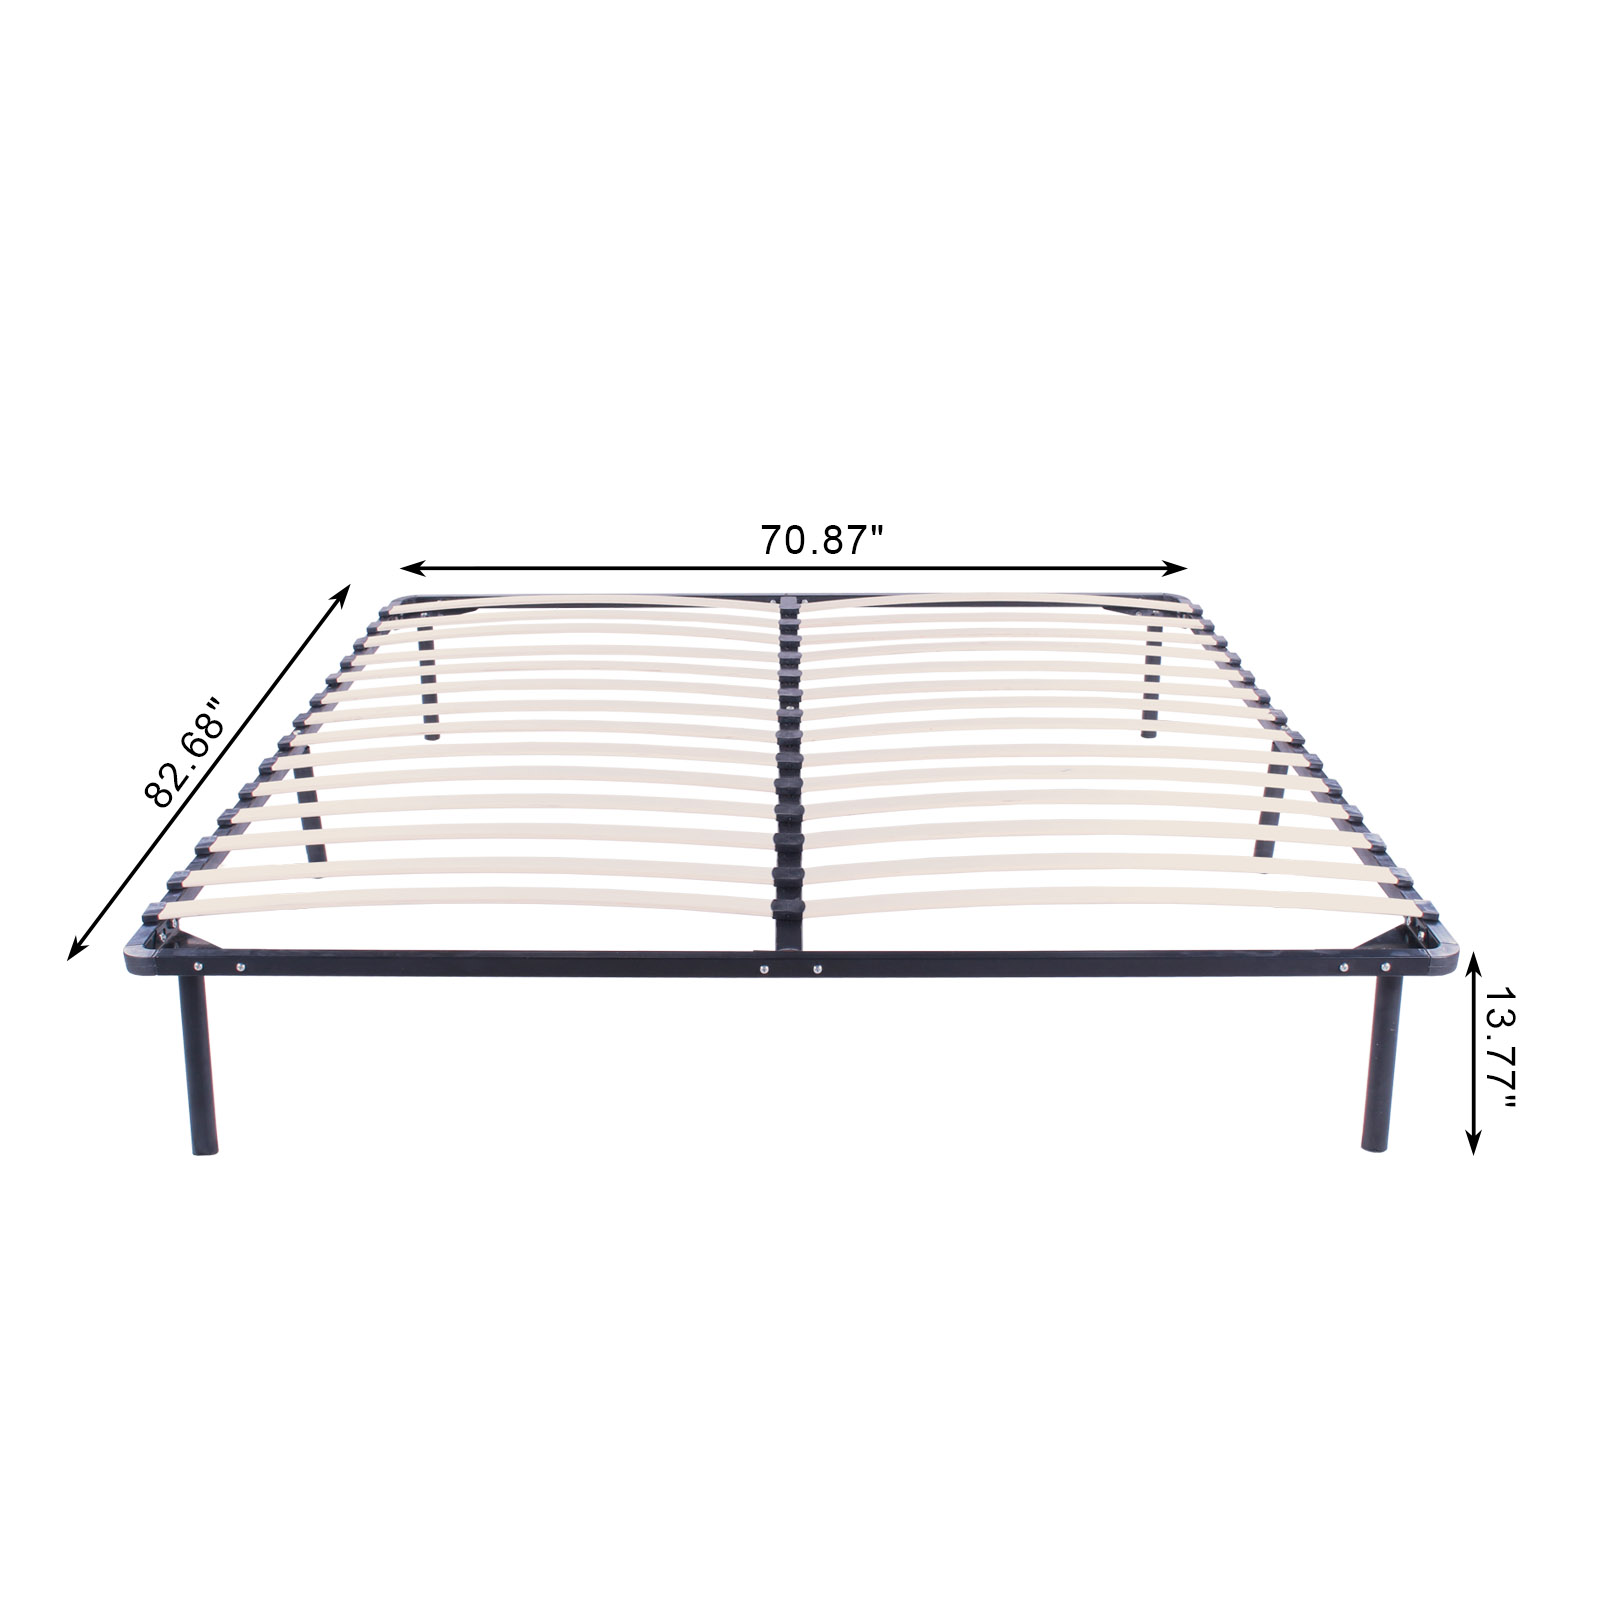 Cal King Size 83 X71 X14 7 Legs Metal Bed Frame Mattress